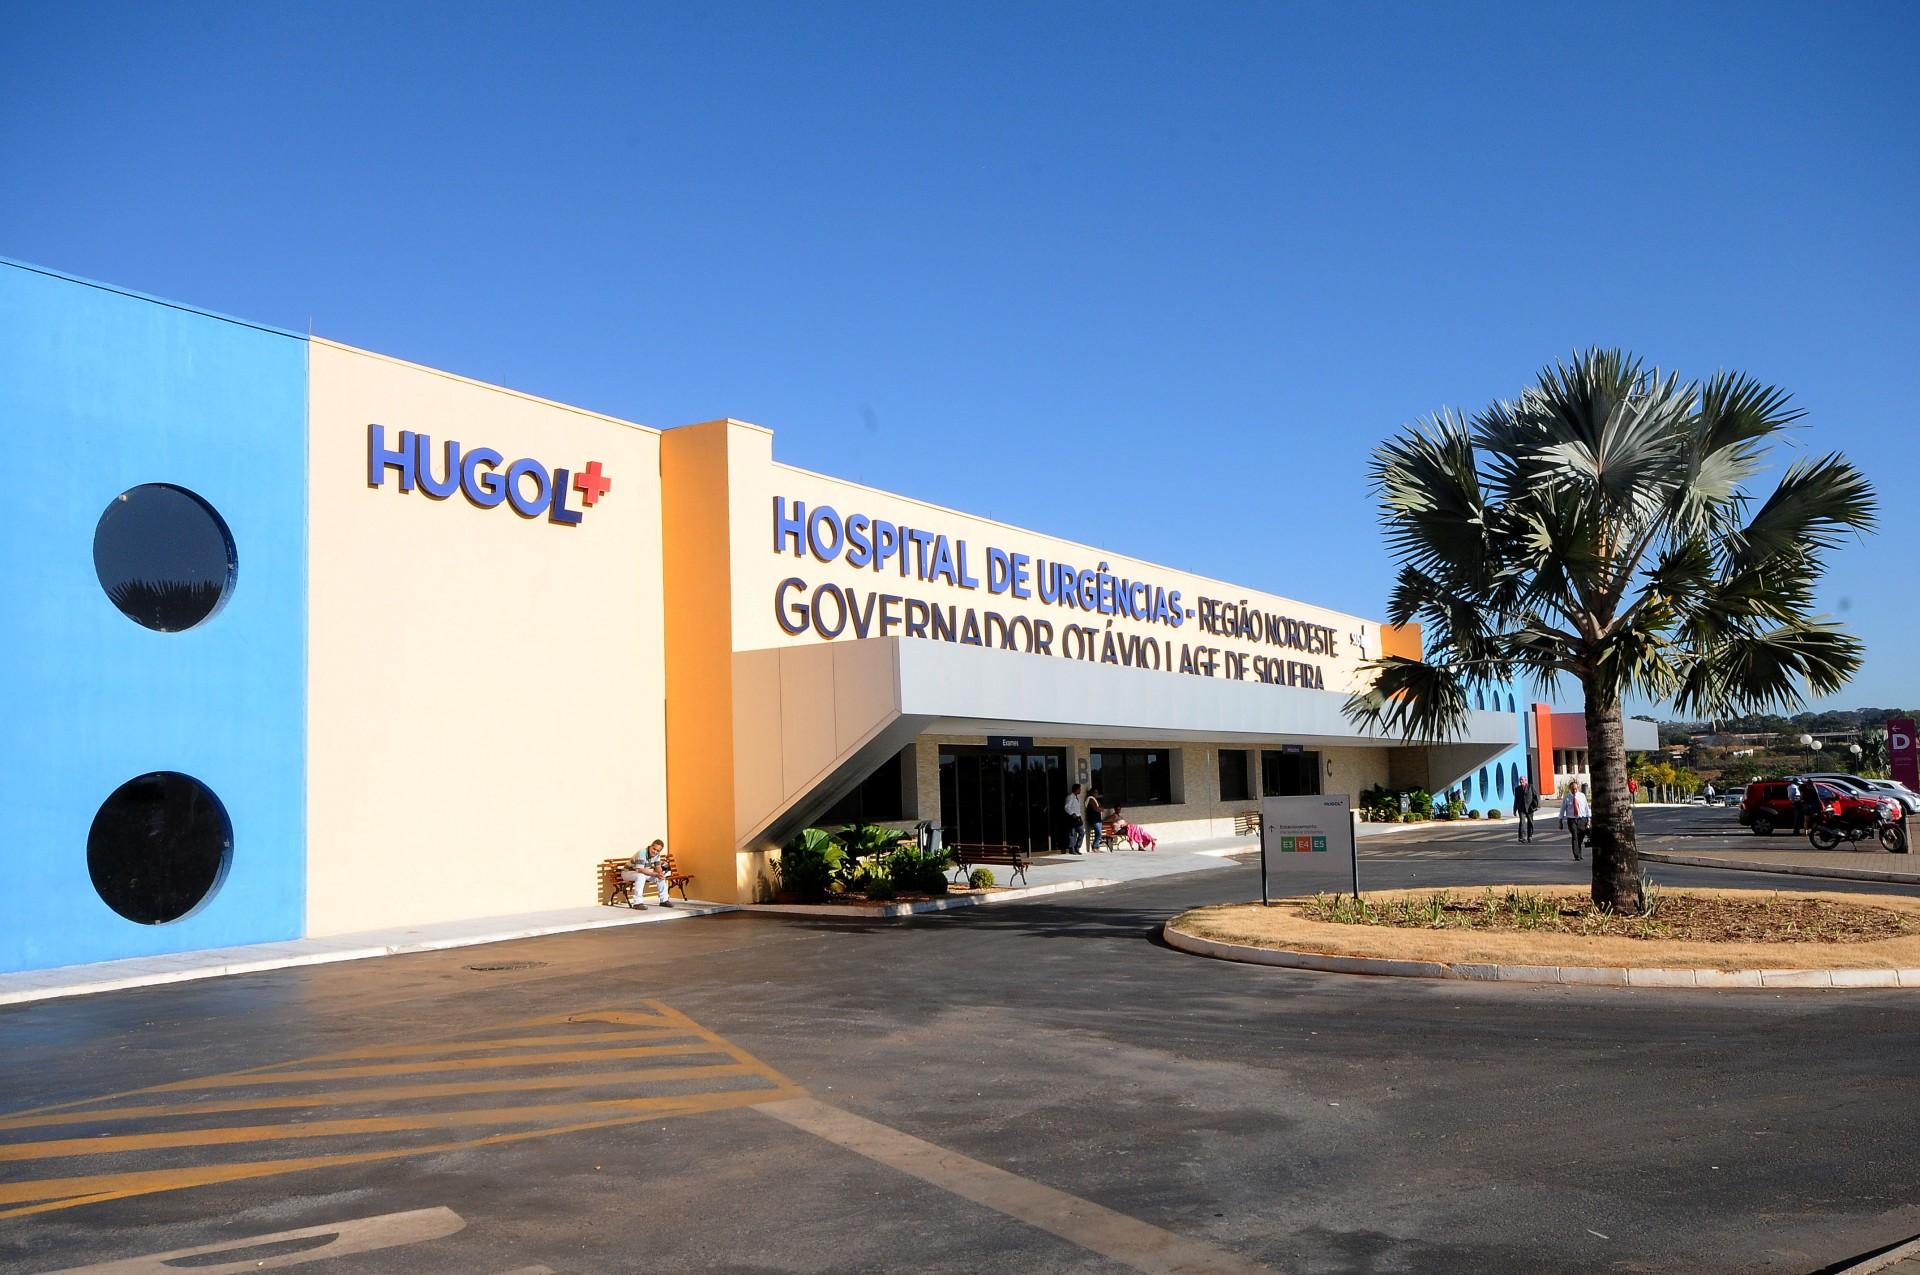 Hugol